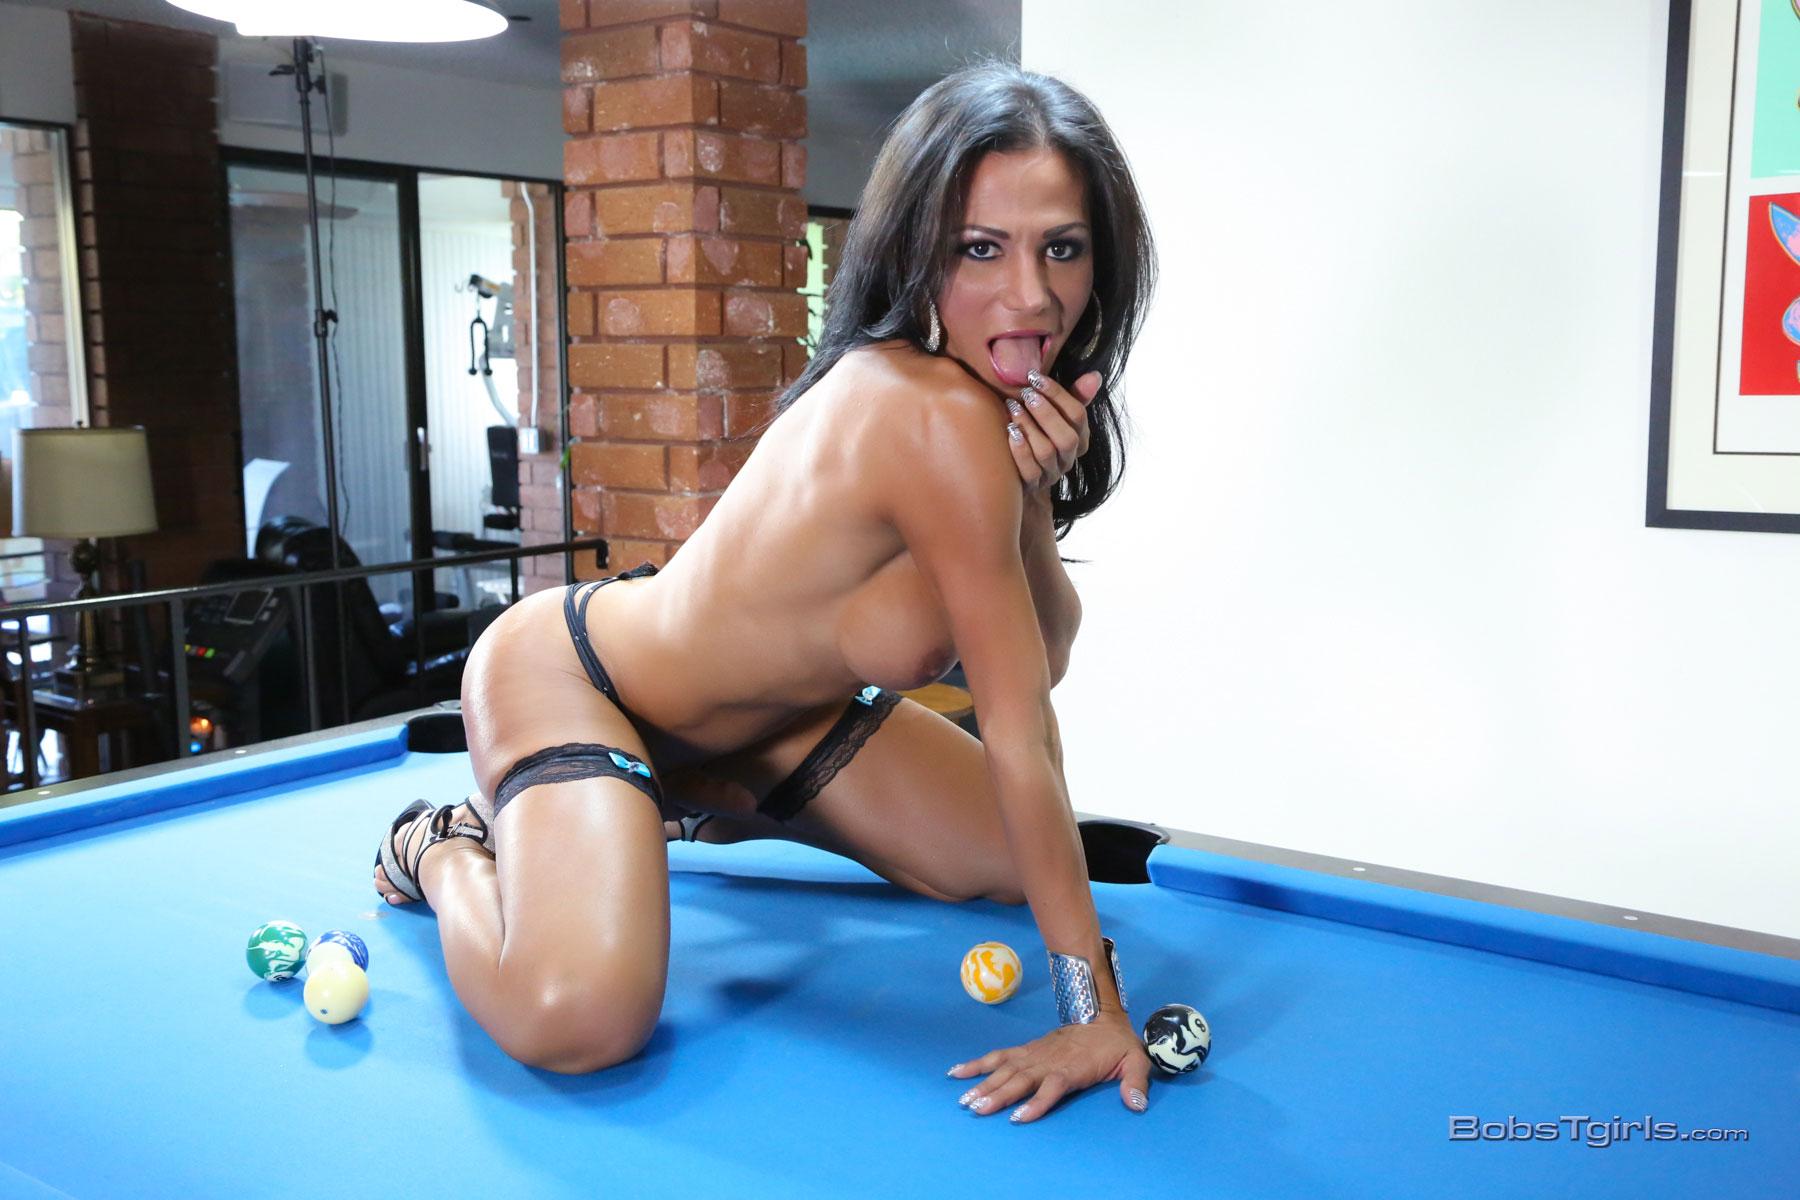 Please spank me mistress